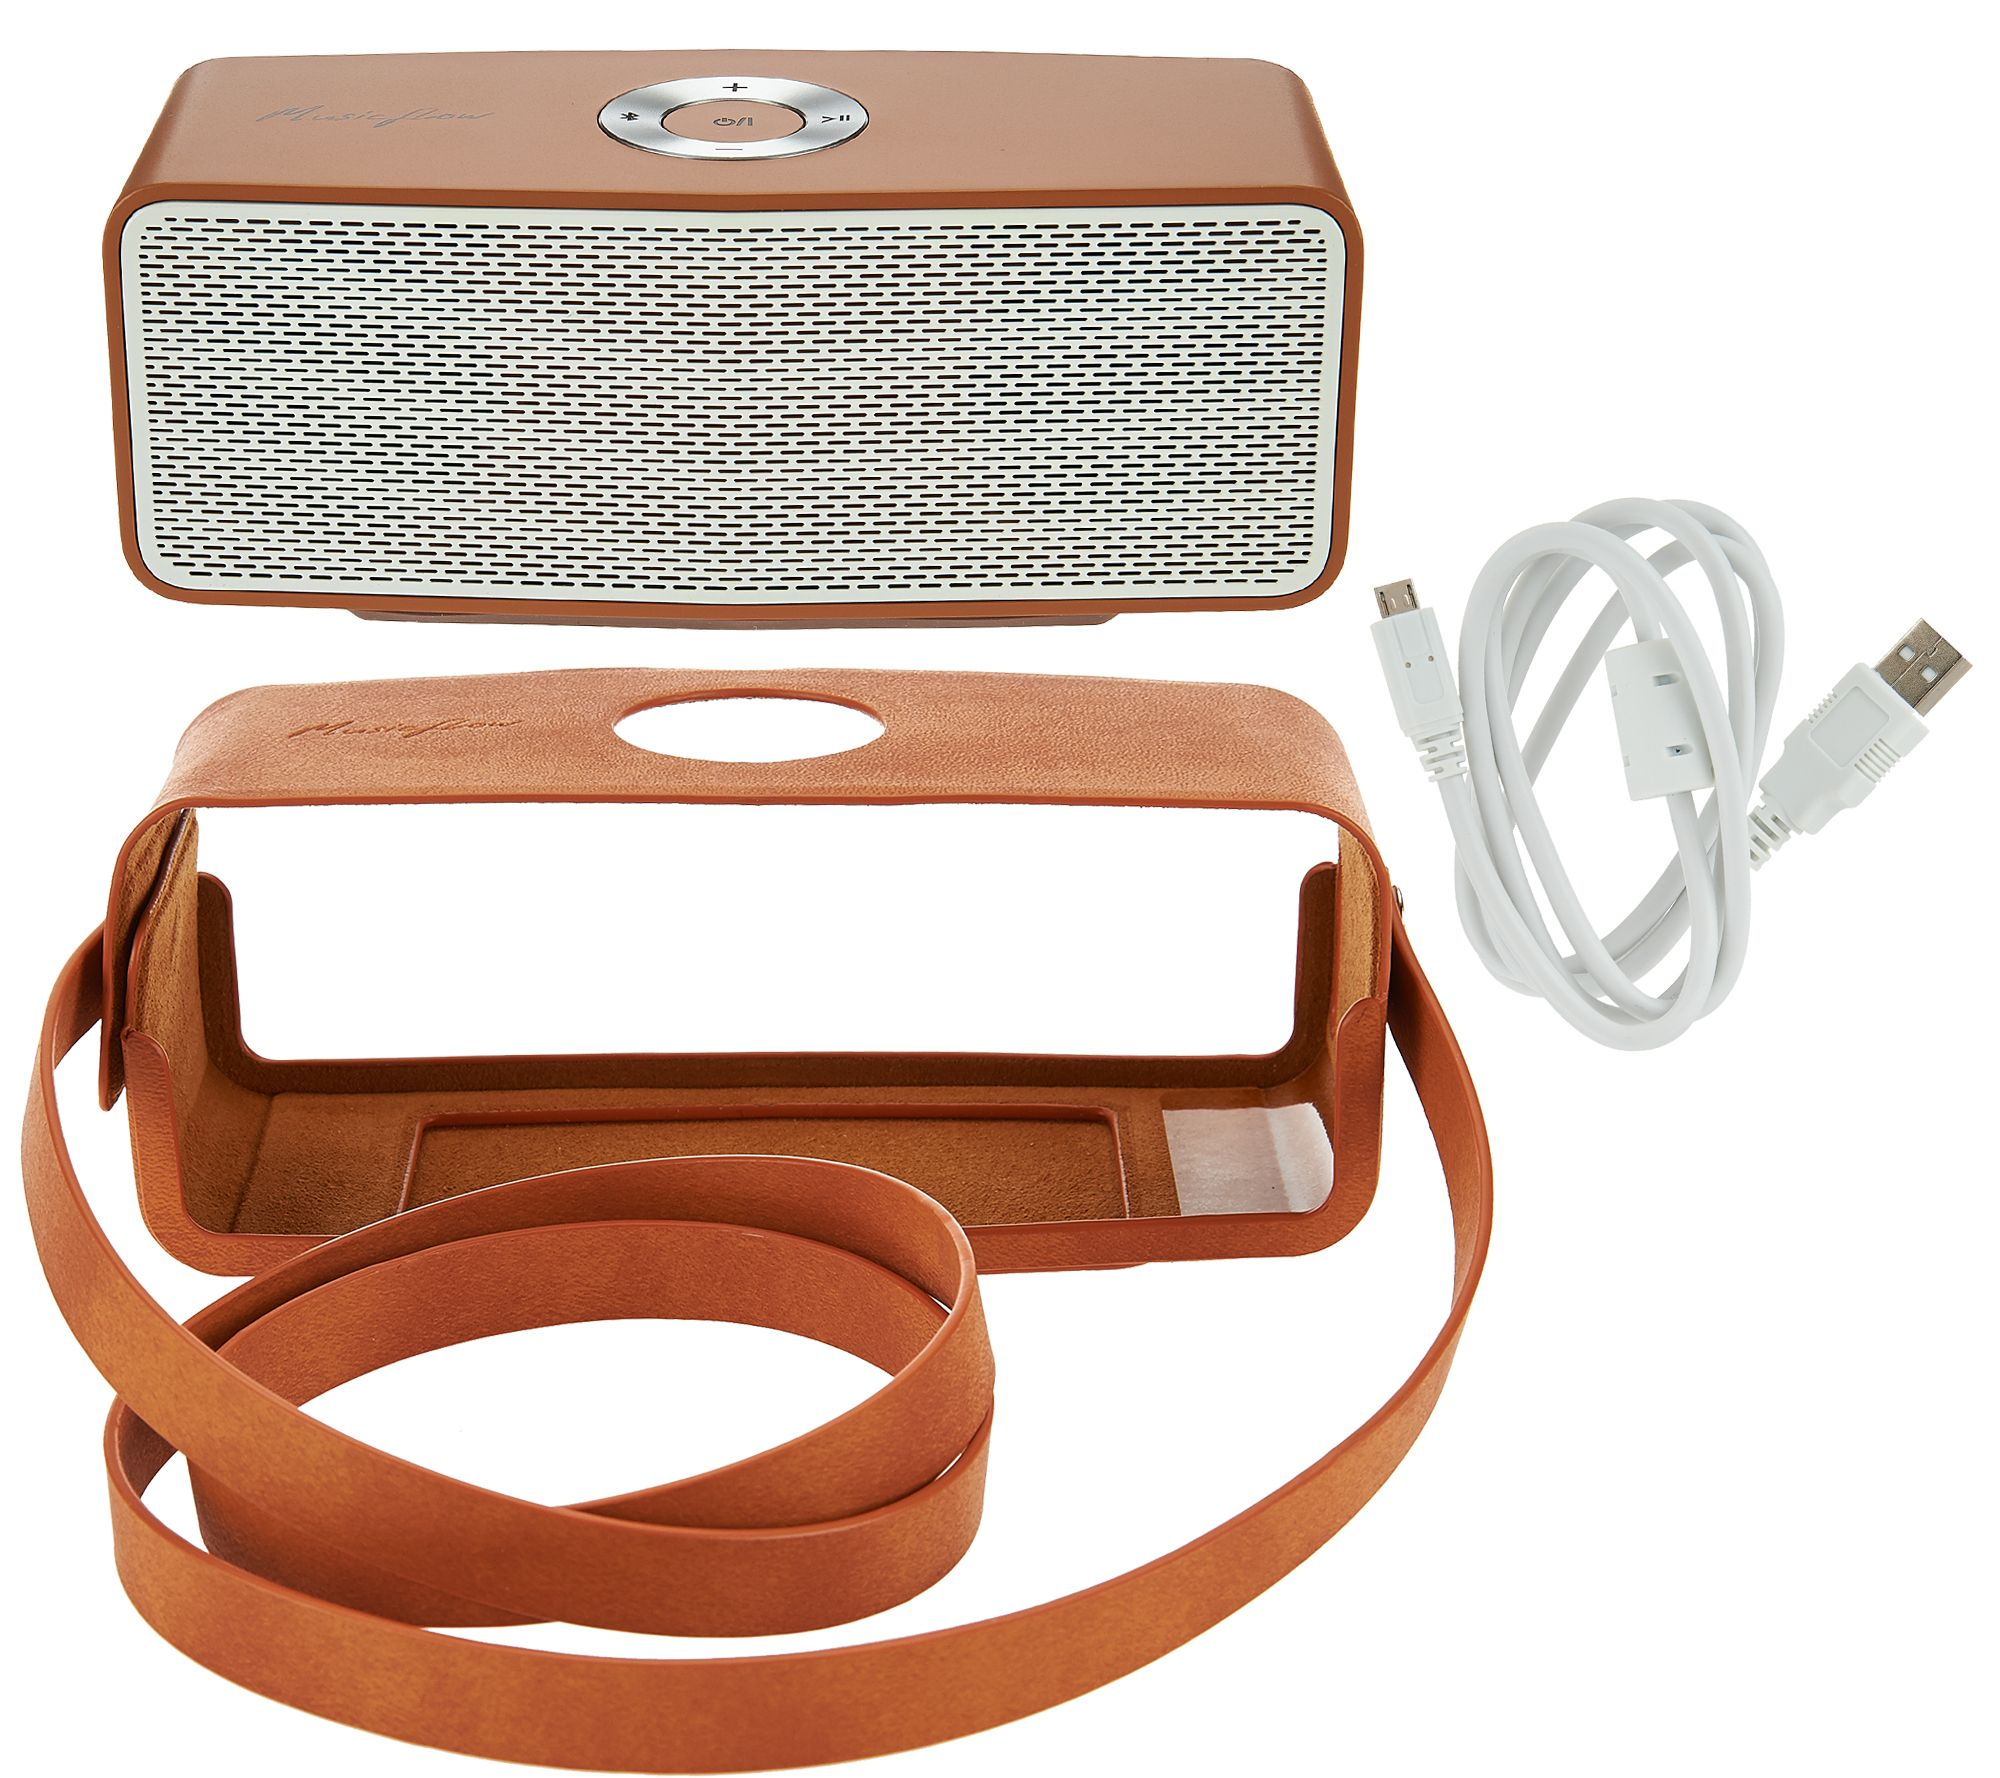 Lg Portable Bluetooth Speaker Np7550: LG Music Flow Portable Bluetooth Speaker W/ Carrying Case